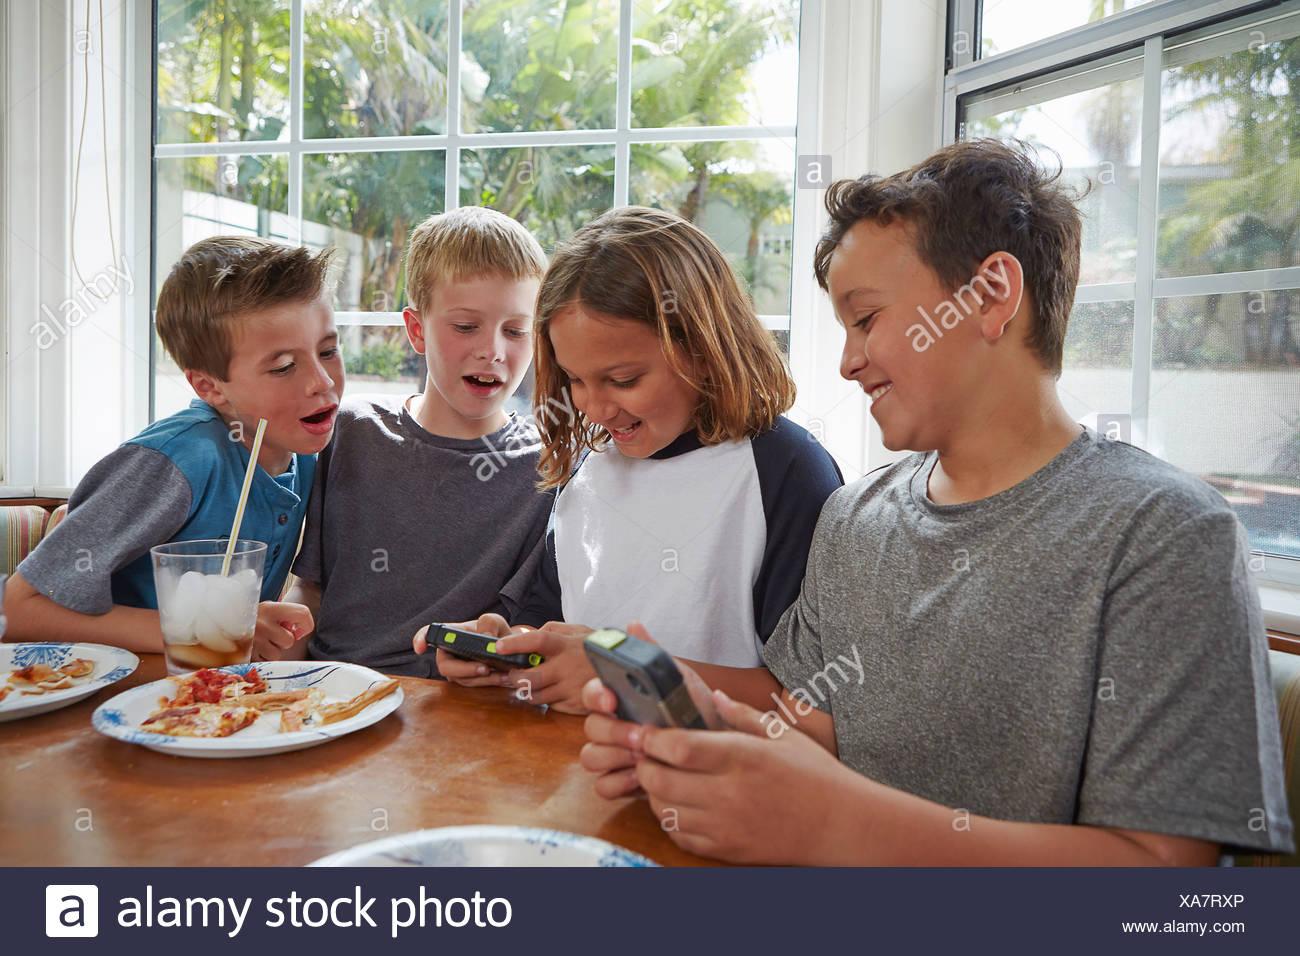 Boys playing handheld video games Stock Photo